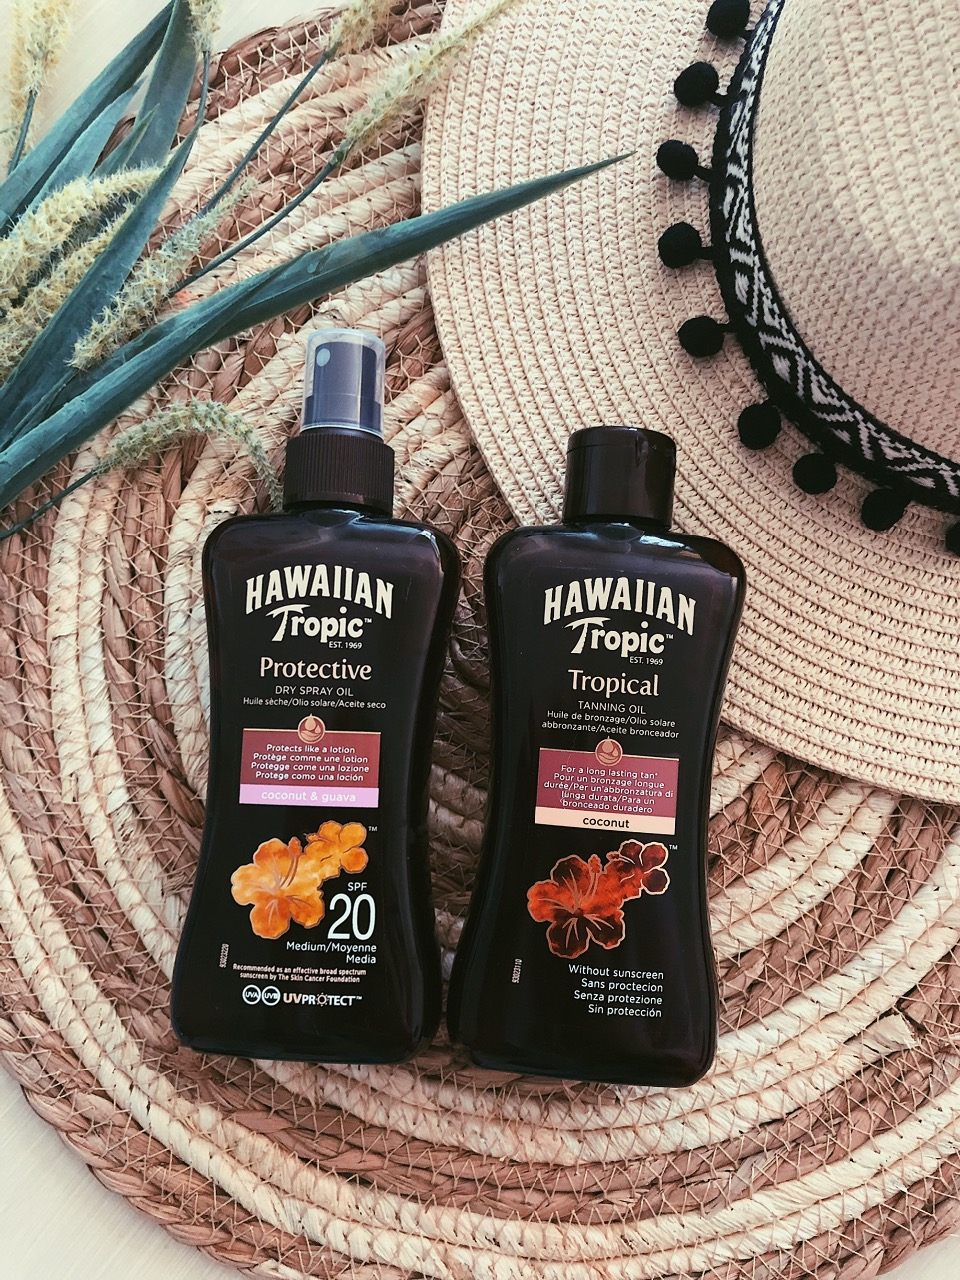 Hawaiian Tropic zonolie tanning oil